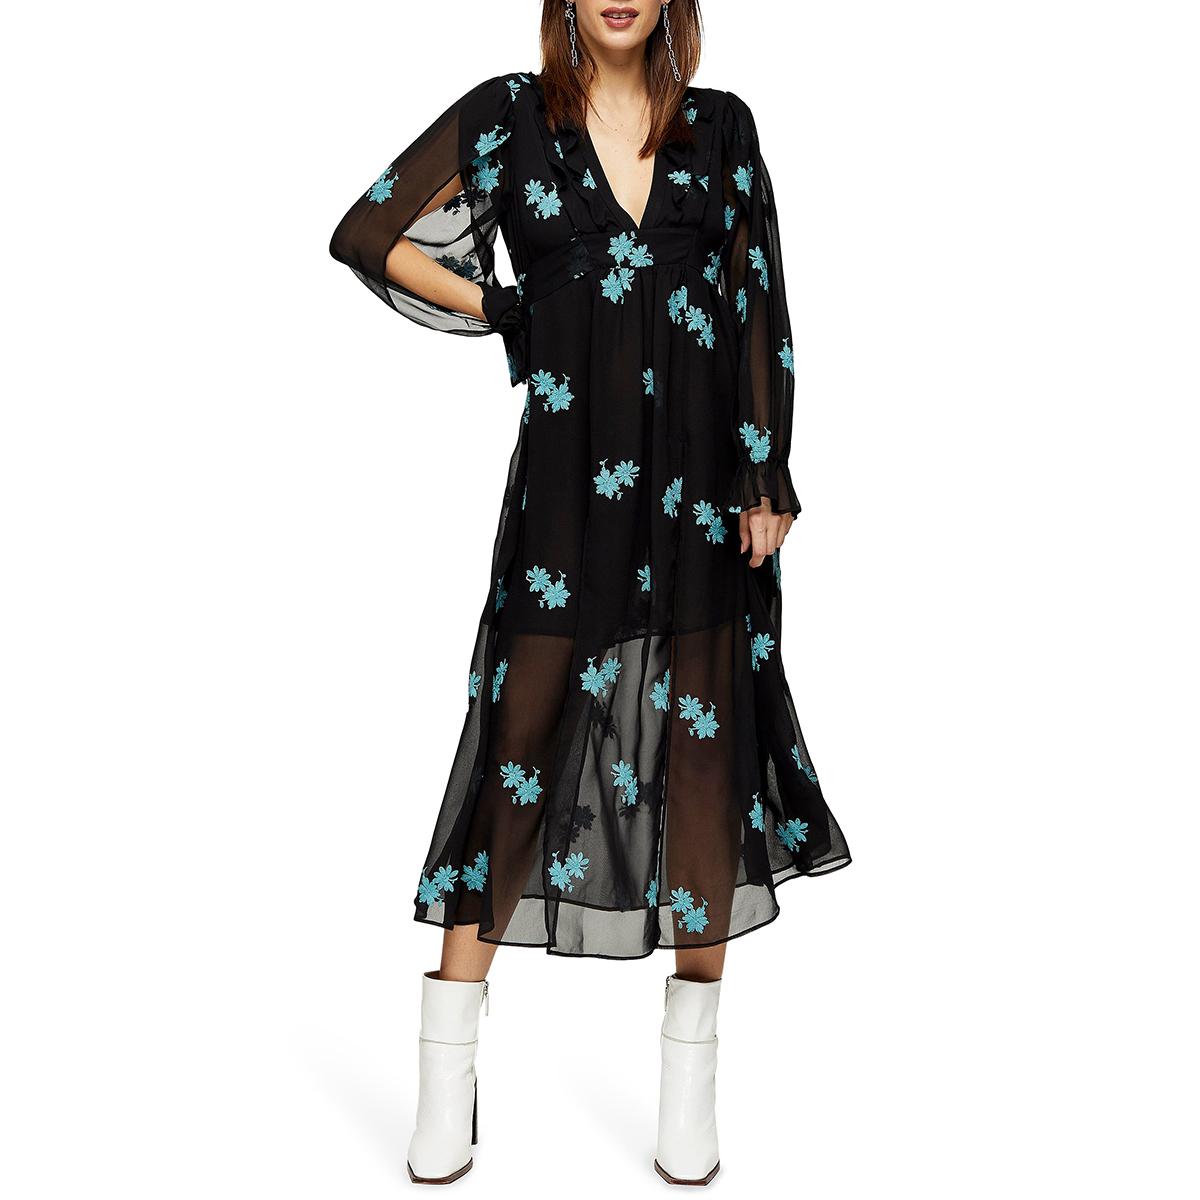 topshop-floral-dress